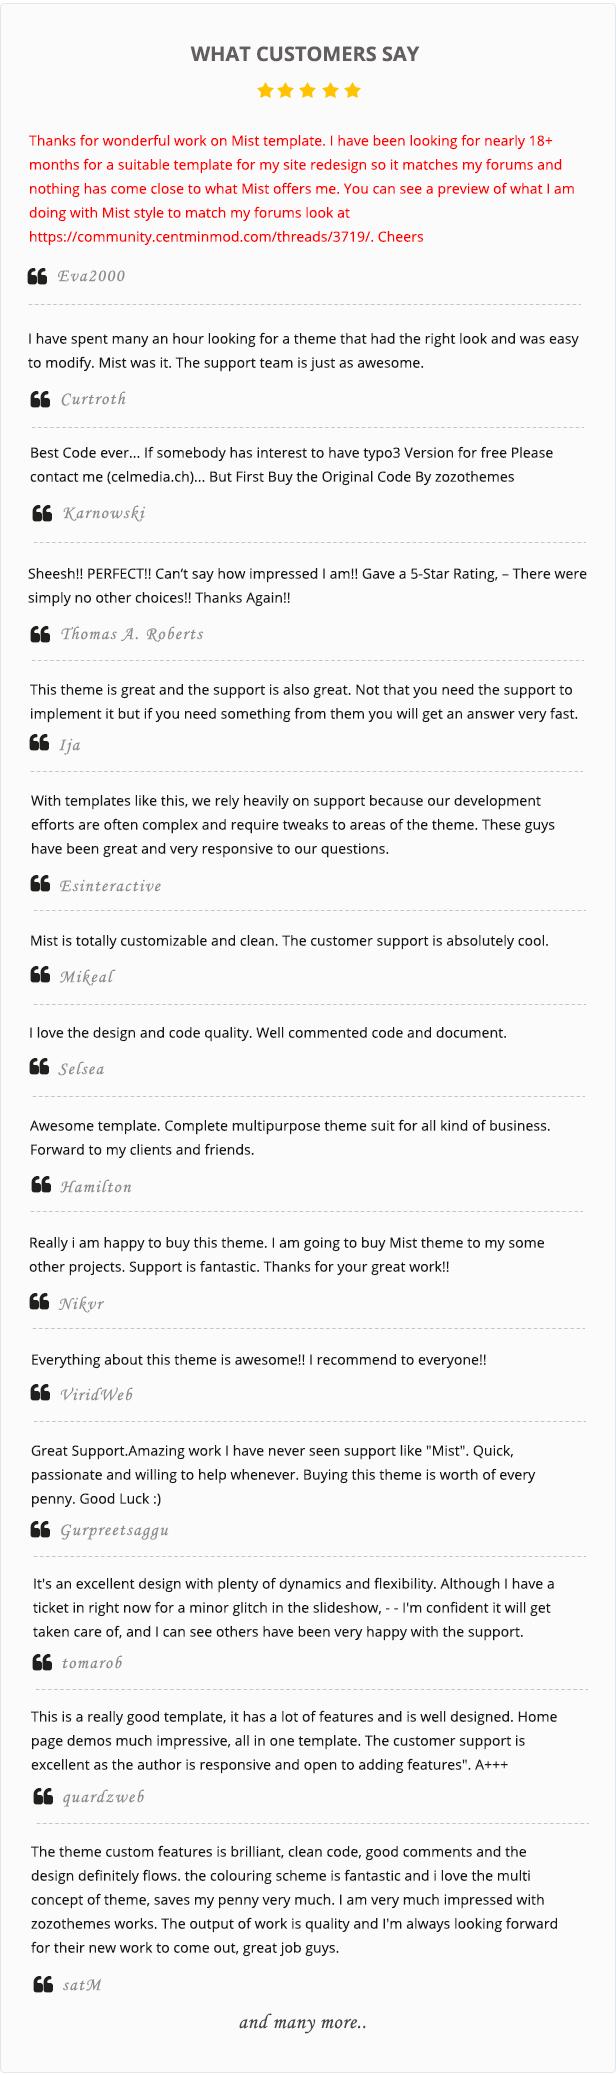 Customer Review image for mist MultiPurpose HTML5 Template